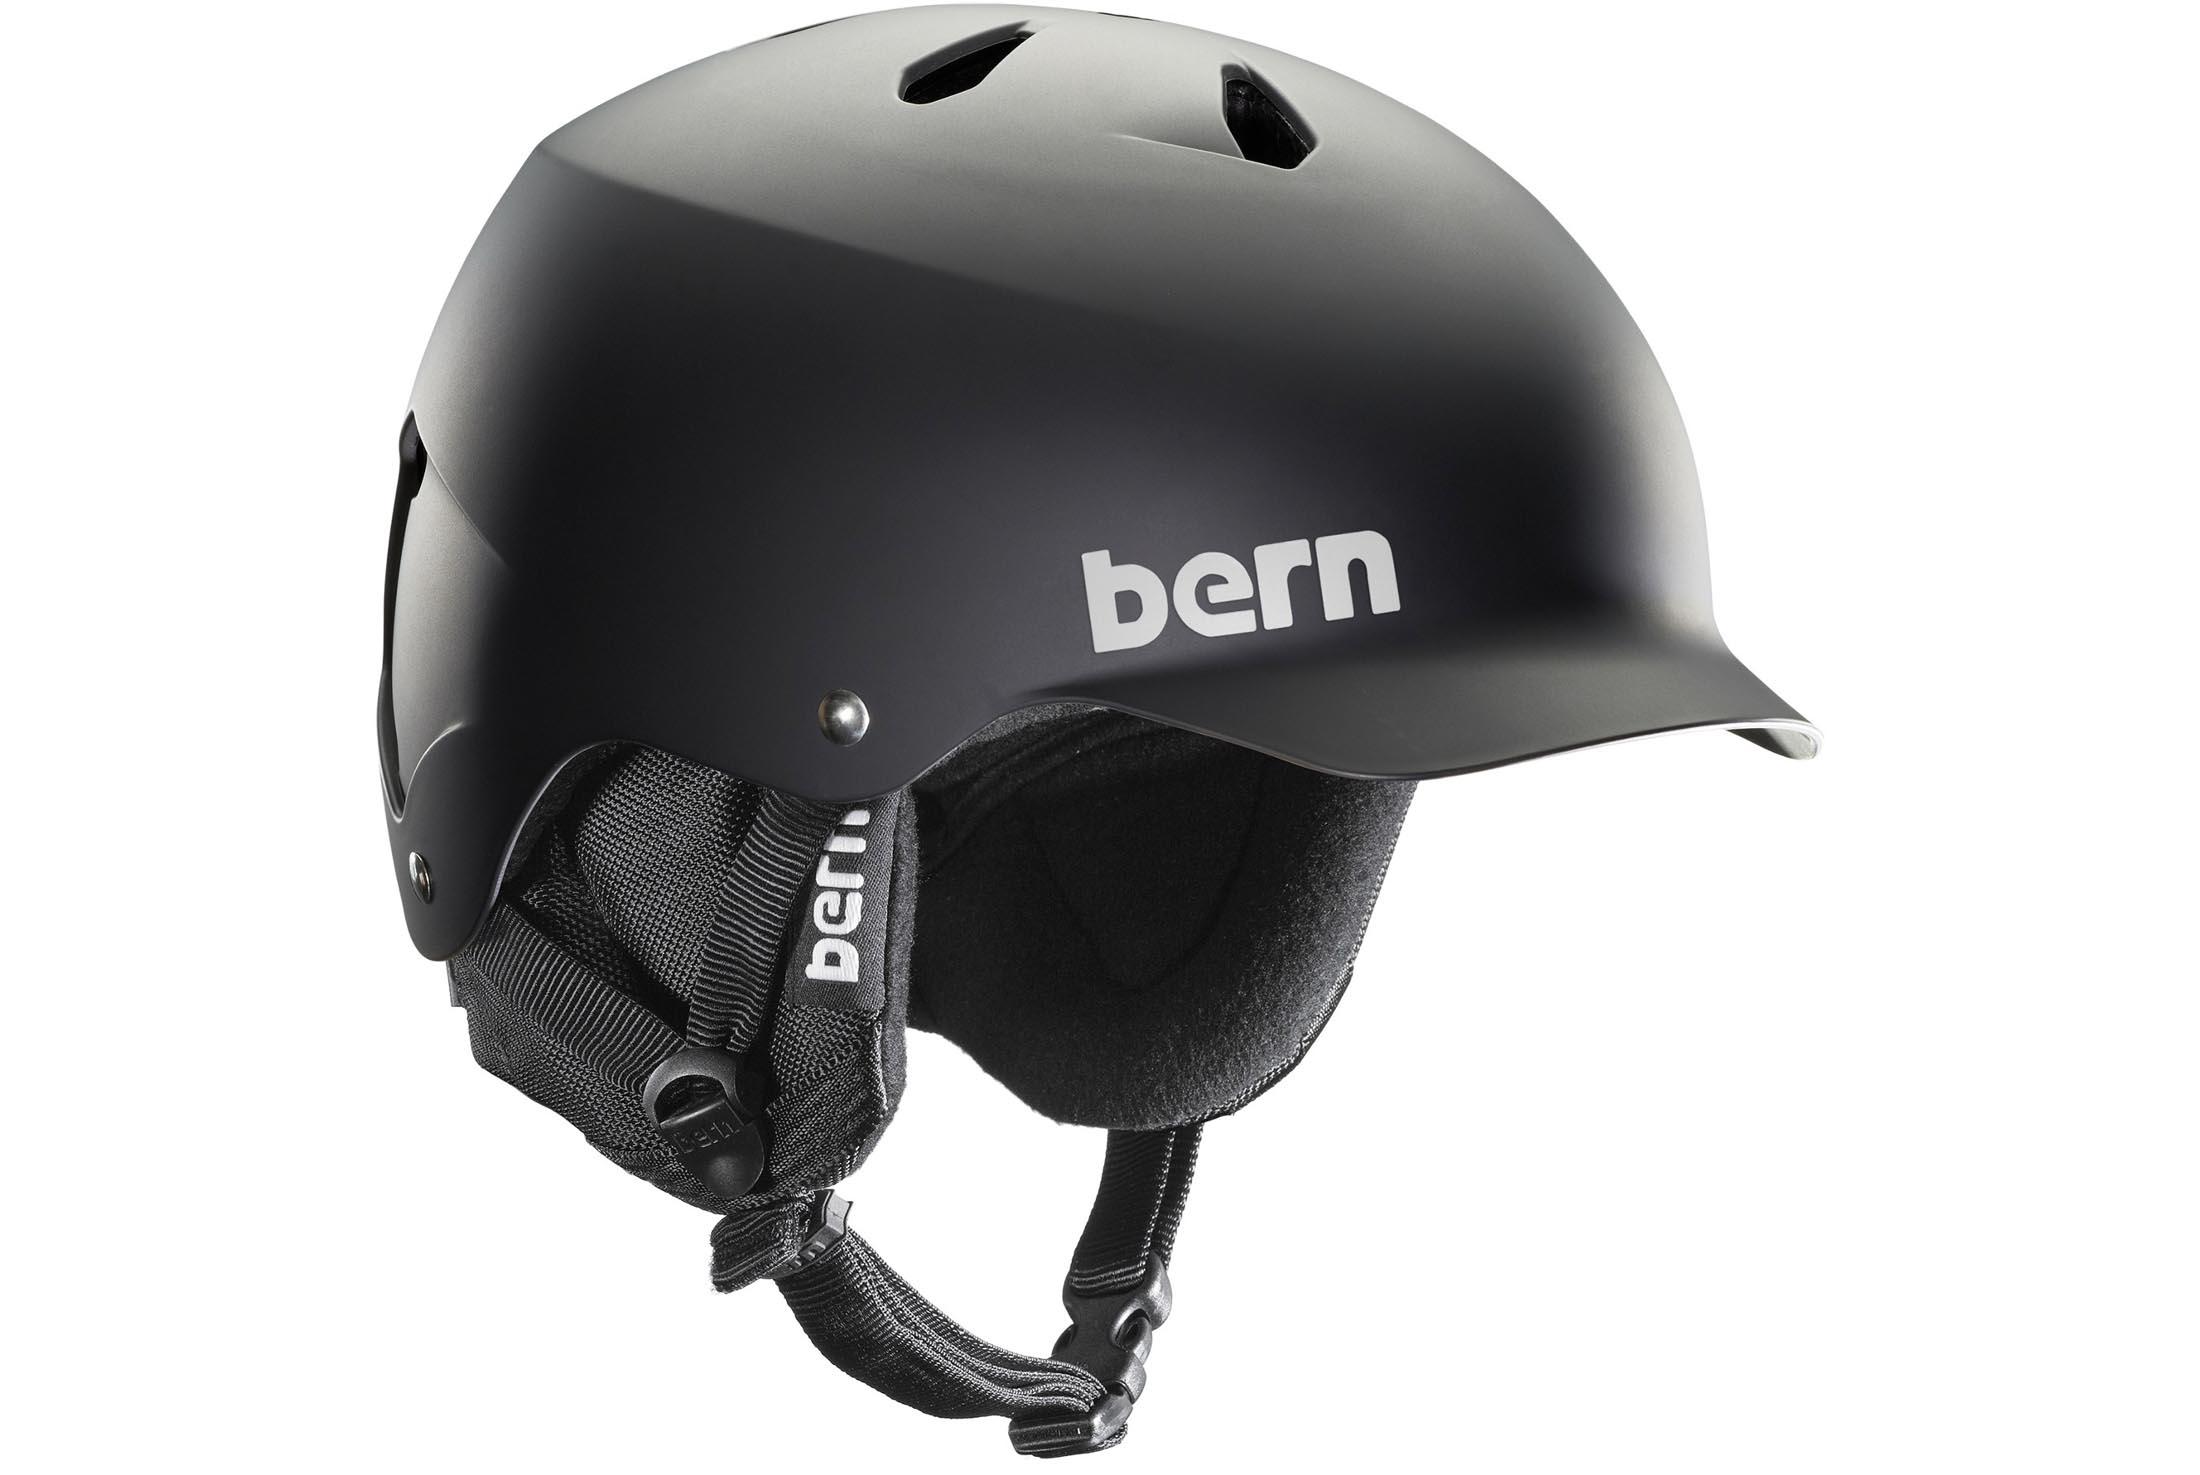 bern helmet